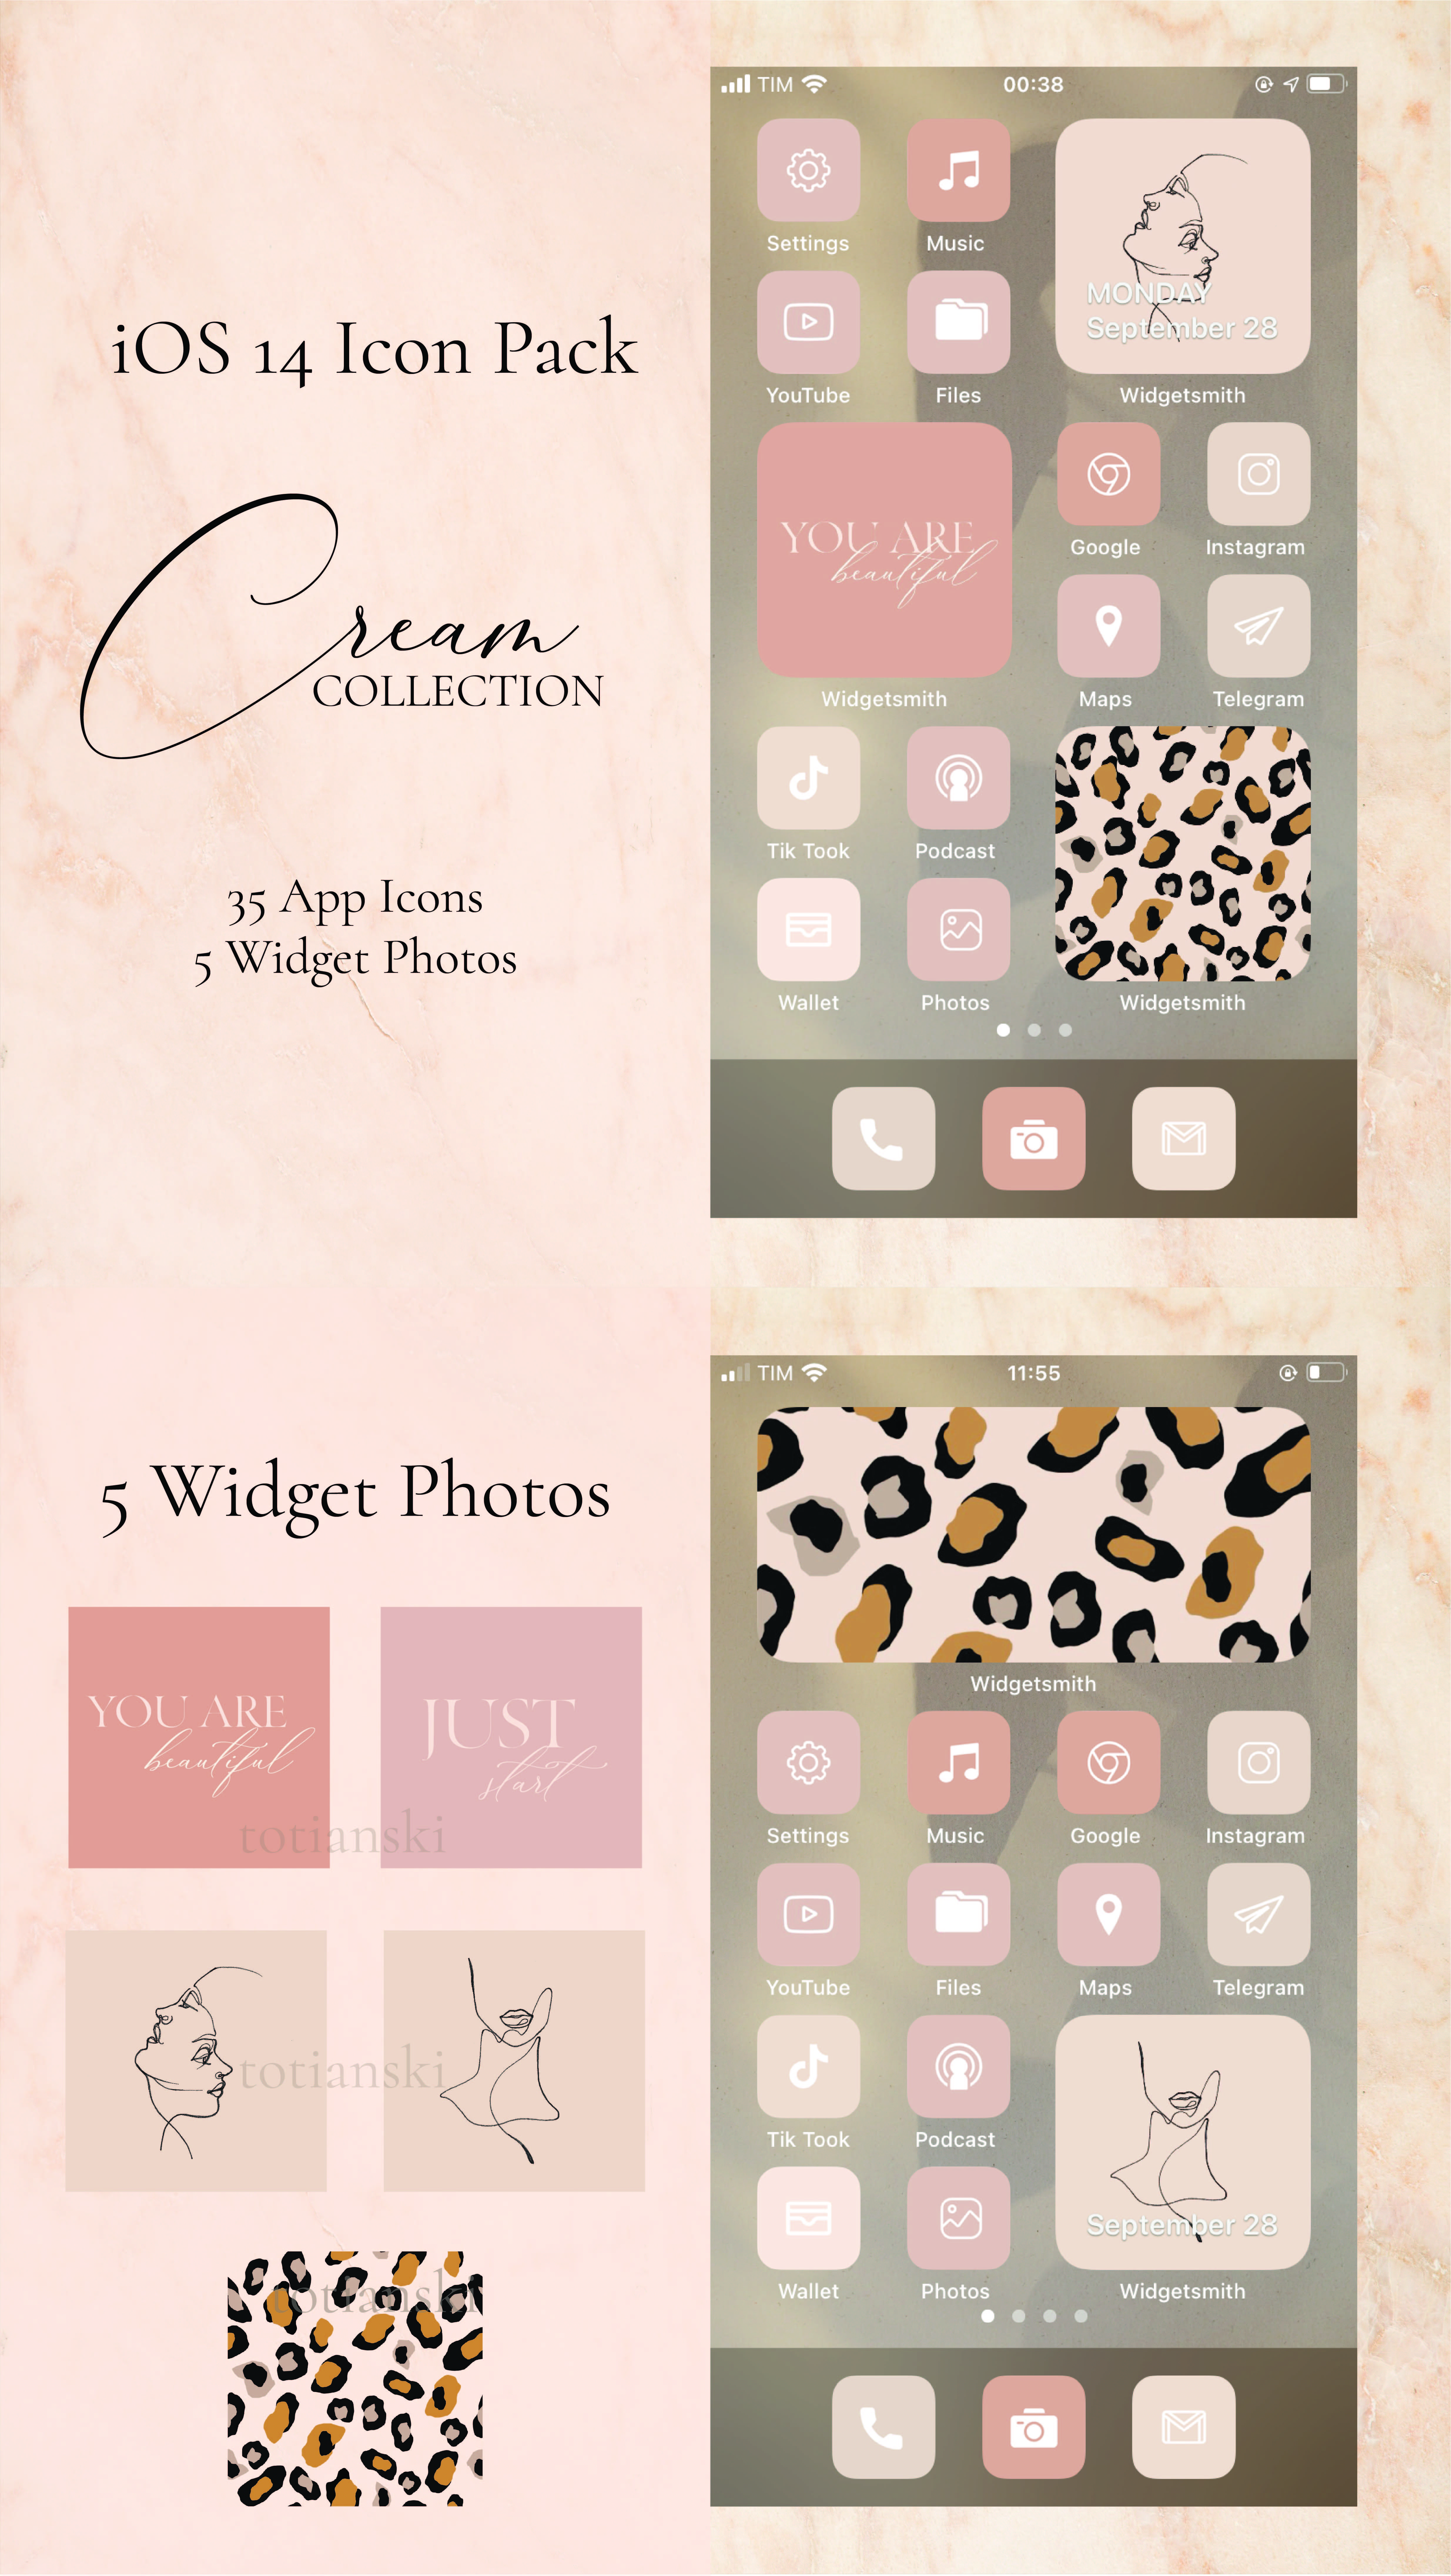 Cream Collection 35 Iphone Ios 14 App Icons Ios14 Widget Photos Widgetsmith Shortcuts Ios Widget Covers Ios 14 Icon Pack In 2020 Iphone Wallpaper App Homescreen Iphone Iphone Design